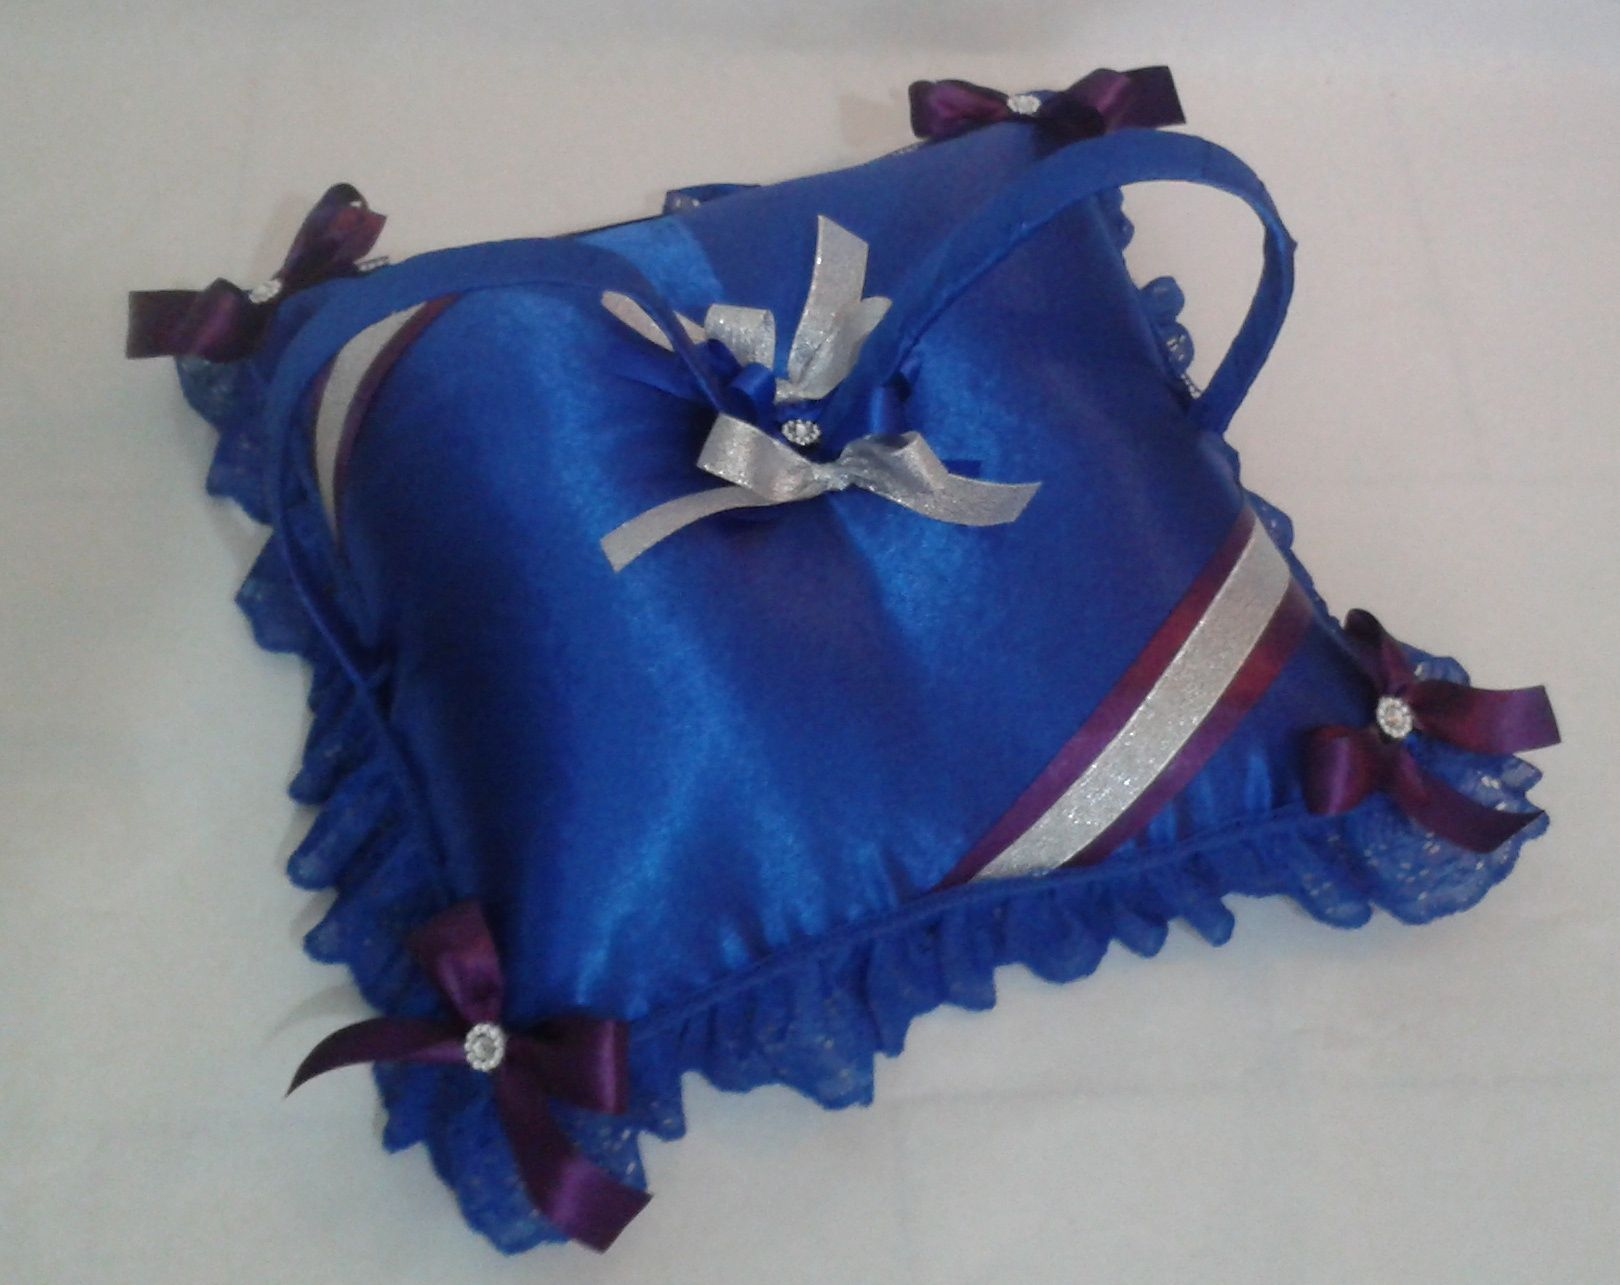 15 Anos Pillows: CO 118 Cojin Para Zapatillas De 15 Años Azul, Morado Y